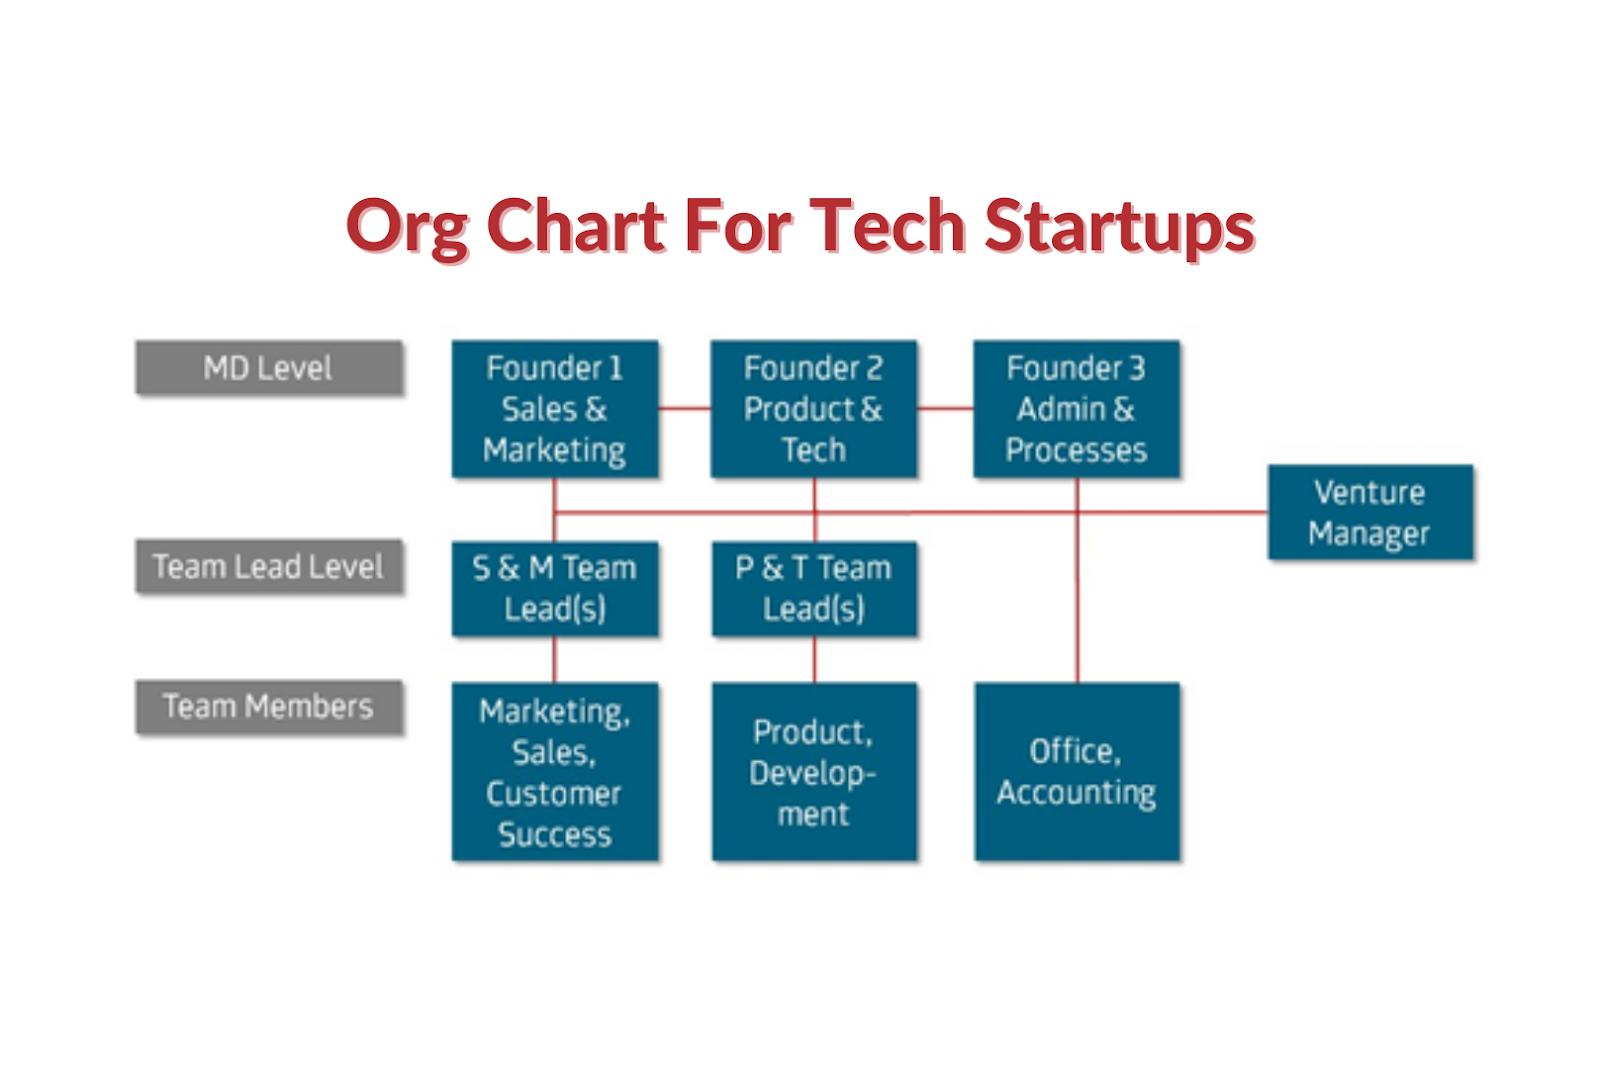 Org chart for tech startups